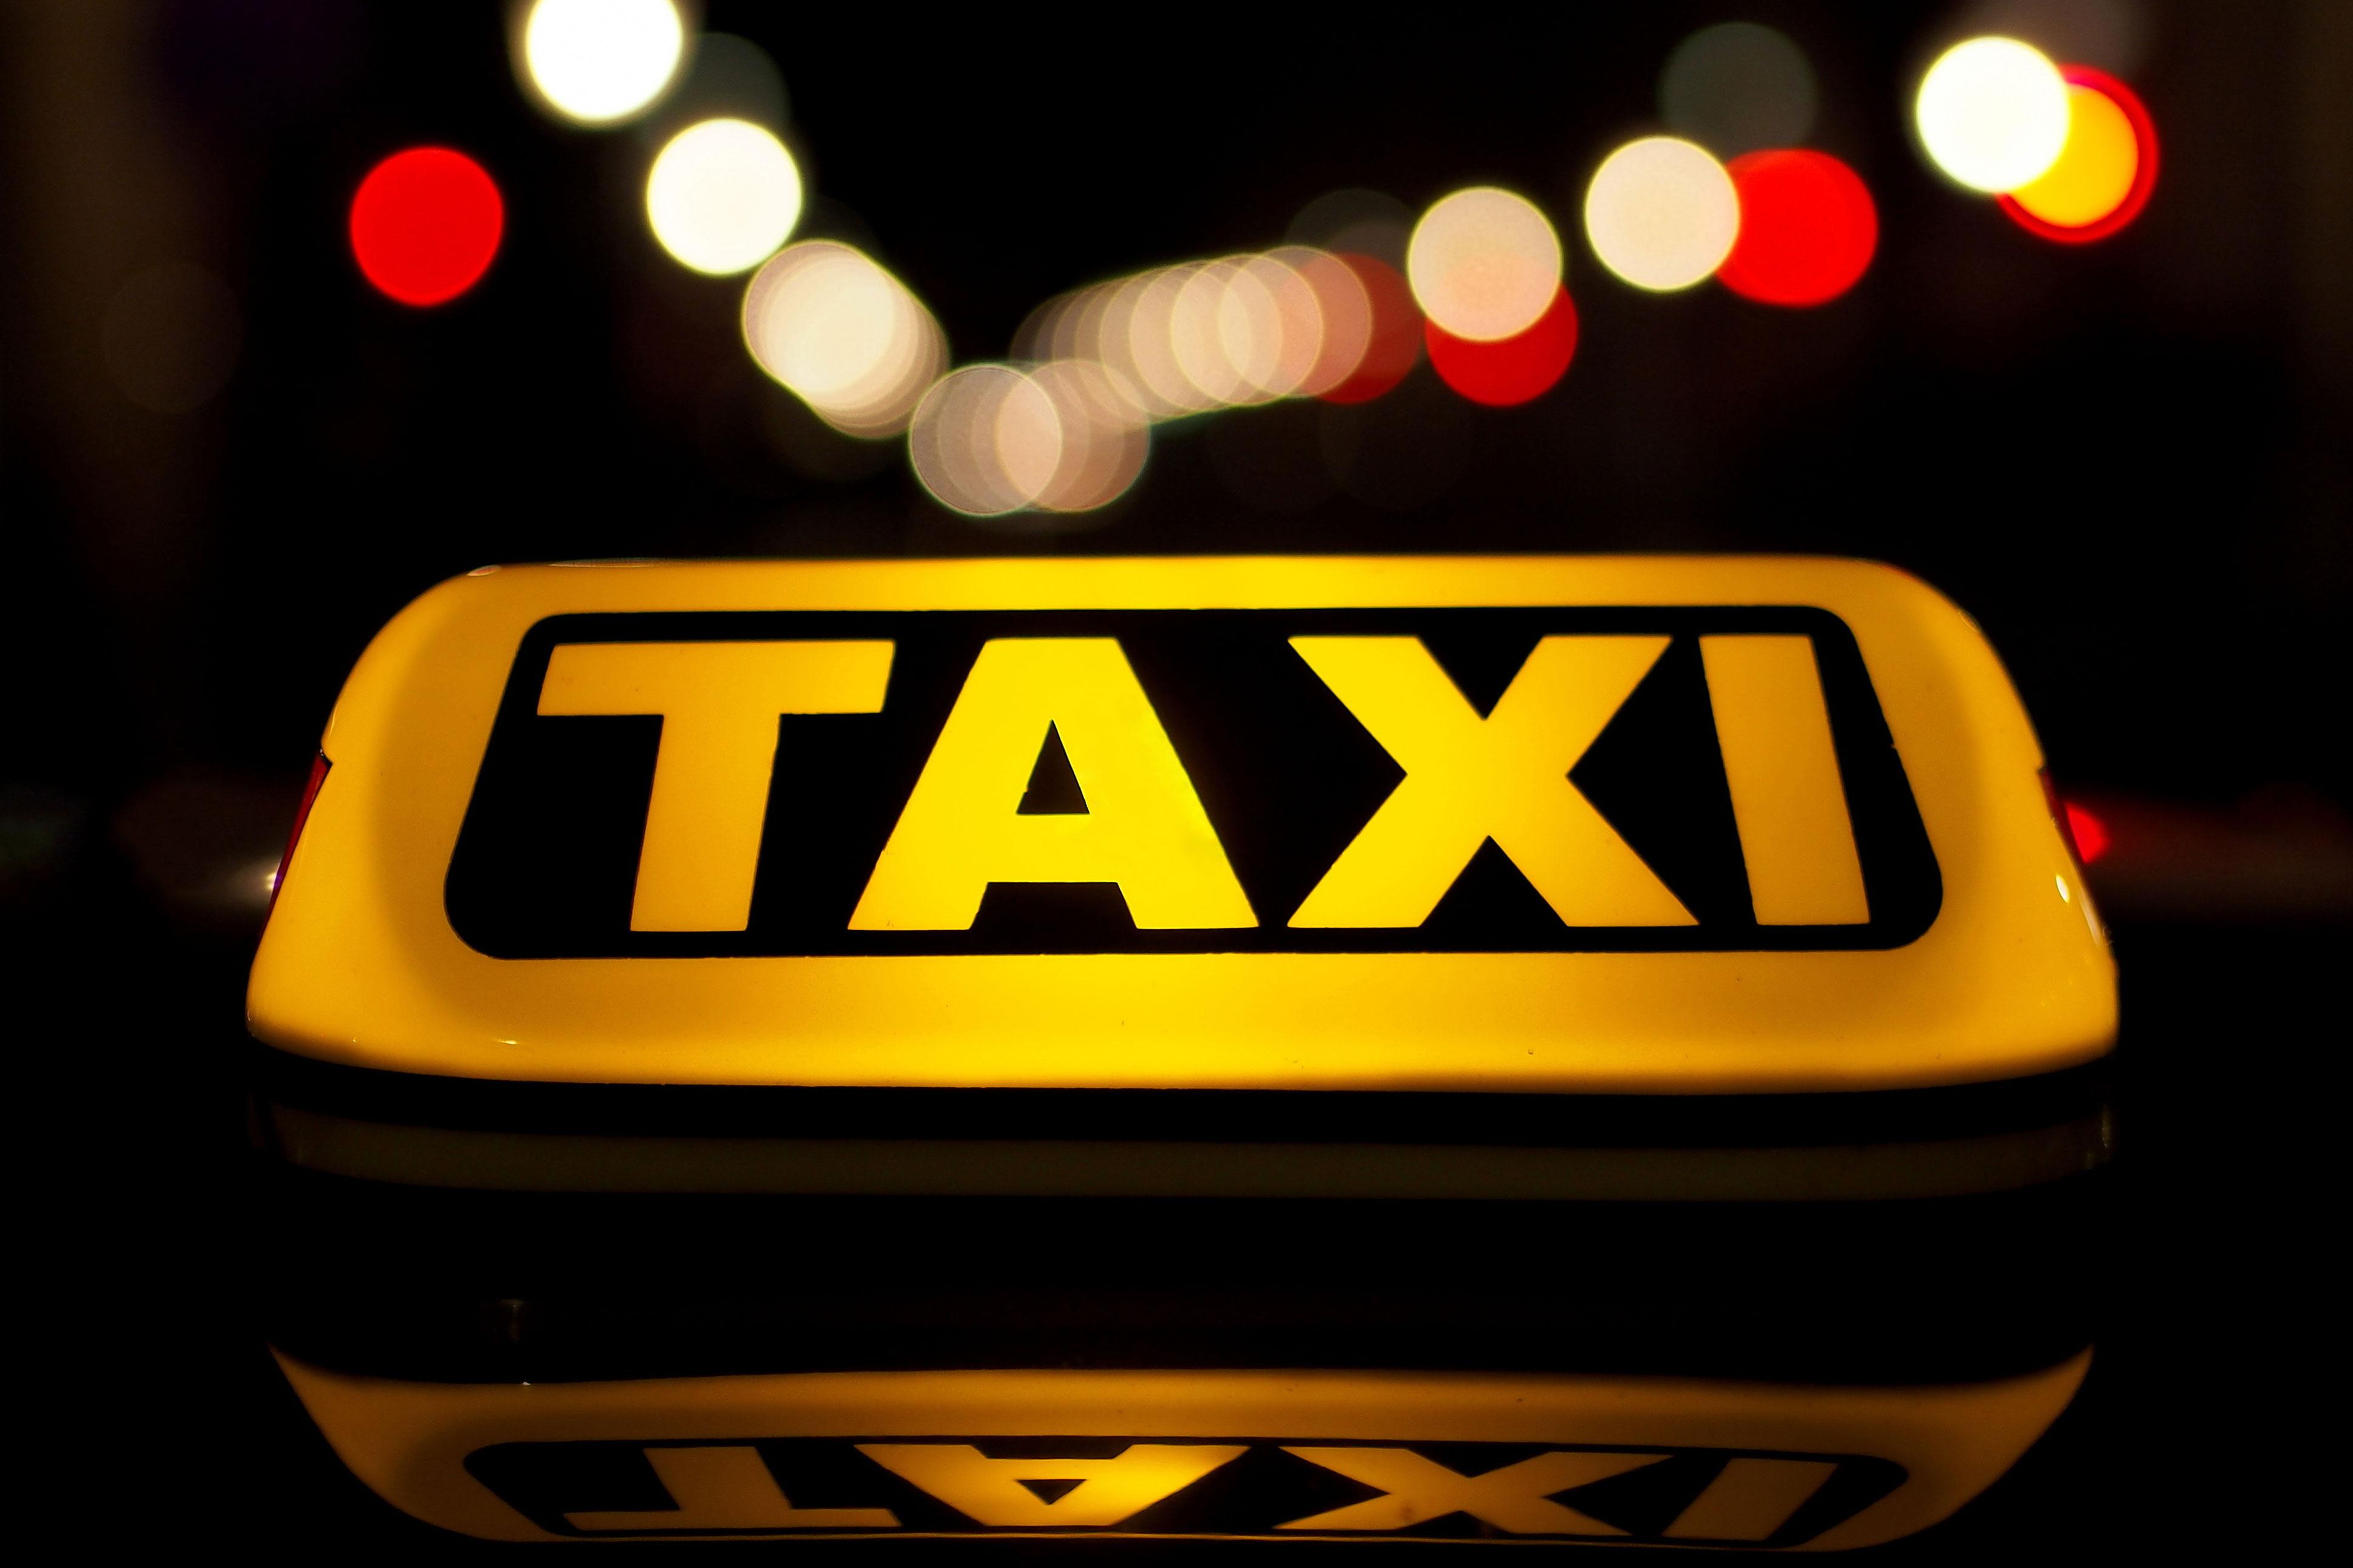 Taxi Hybrid Car Services | Set Right Automotives